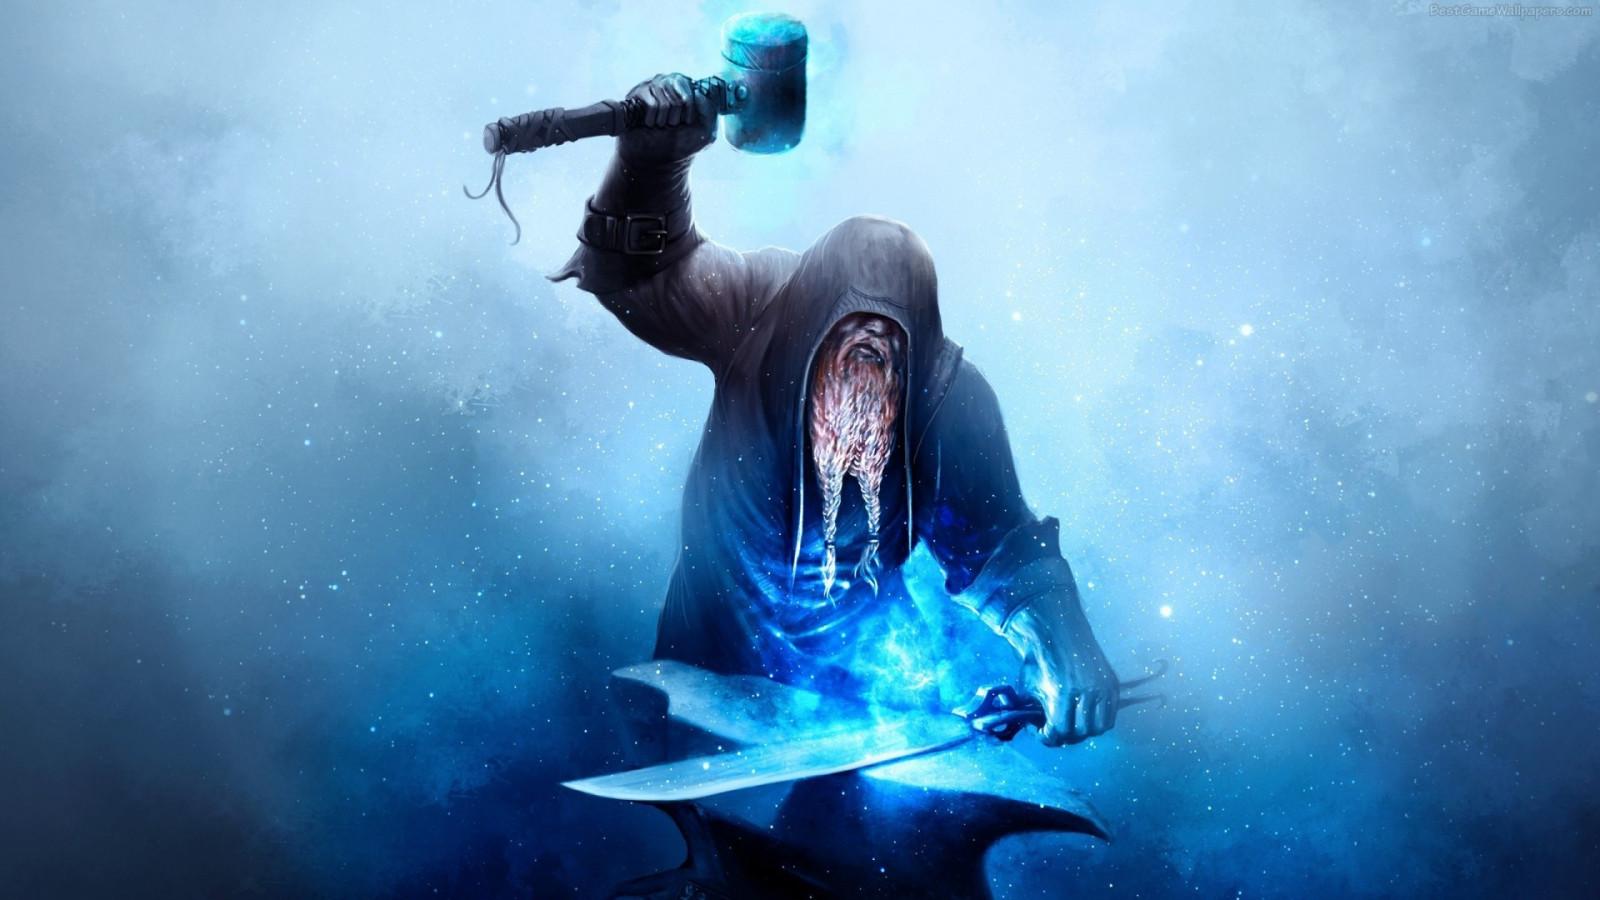 Fantasy Art Abstract 3D Blue Sword Underwater Hammer Blacksmith Anvil Dwarf Hammerman Screenshot Computer Wallpaper Extreme